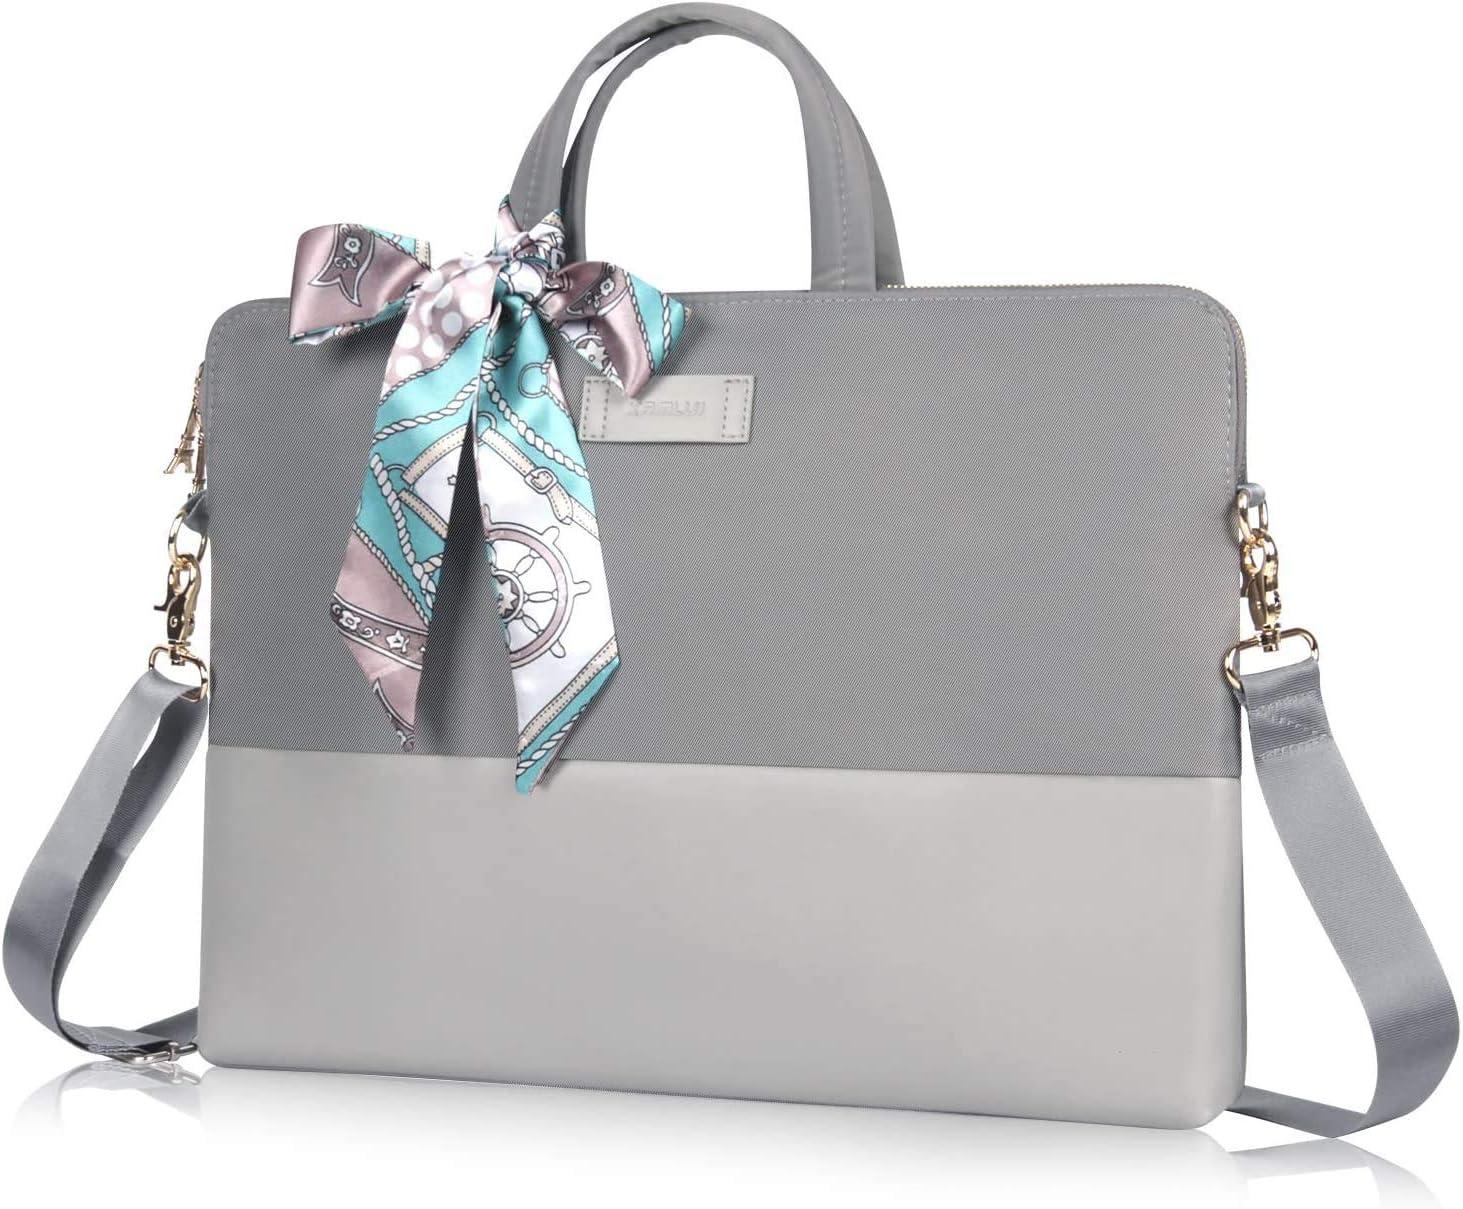 Kamlui 14 Inch Laptop Bag - for Women Computer Shoulder Messenger Laptop Case (Gray)